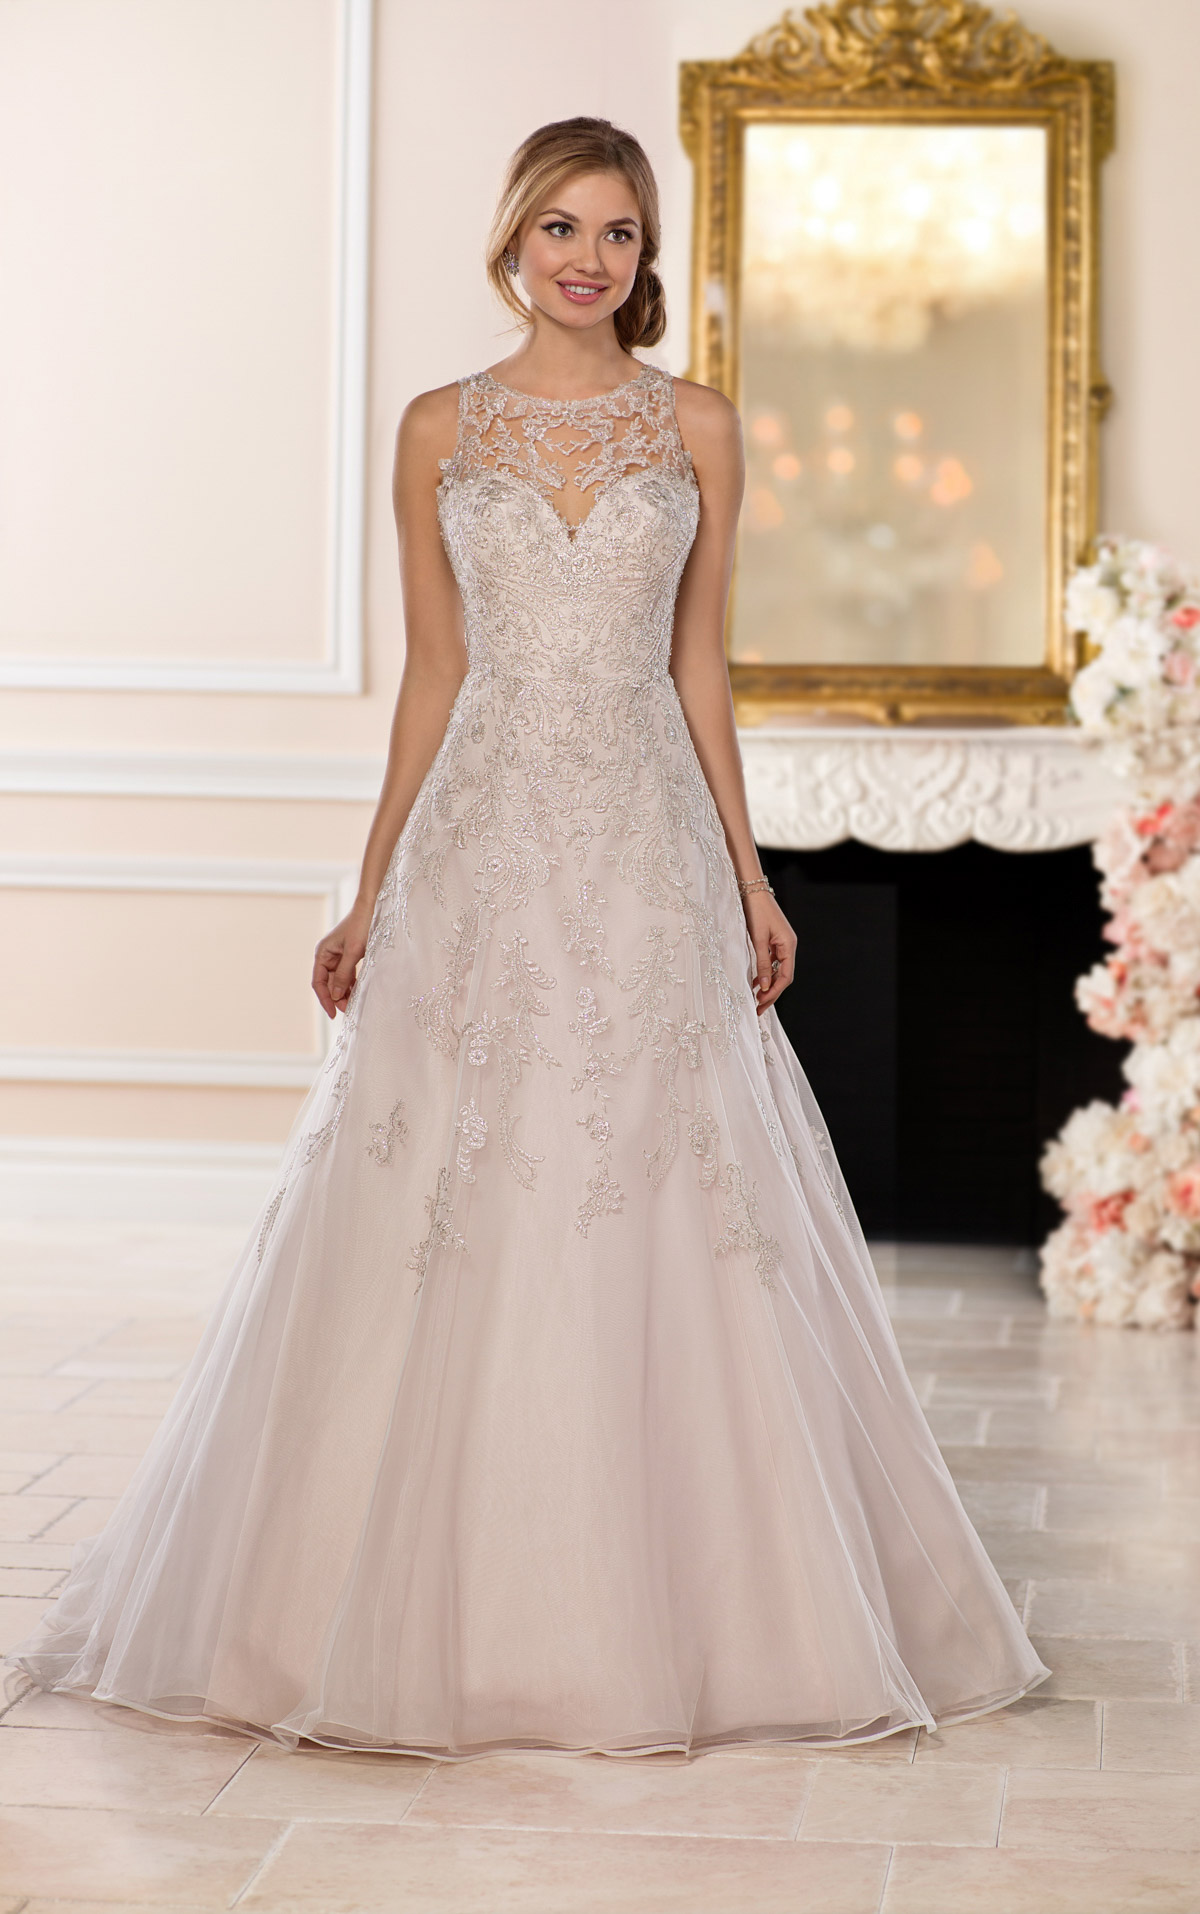 halter style wedding dresses photo - 1